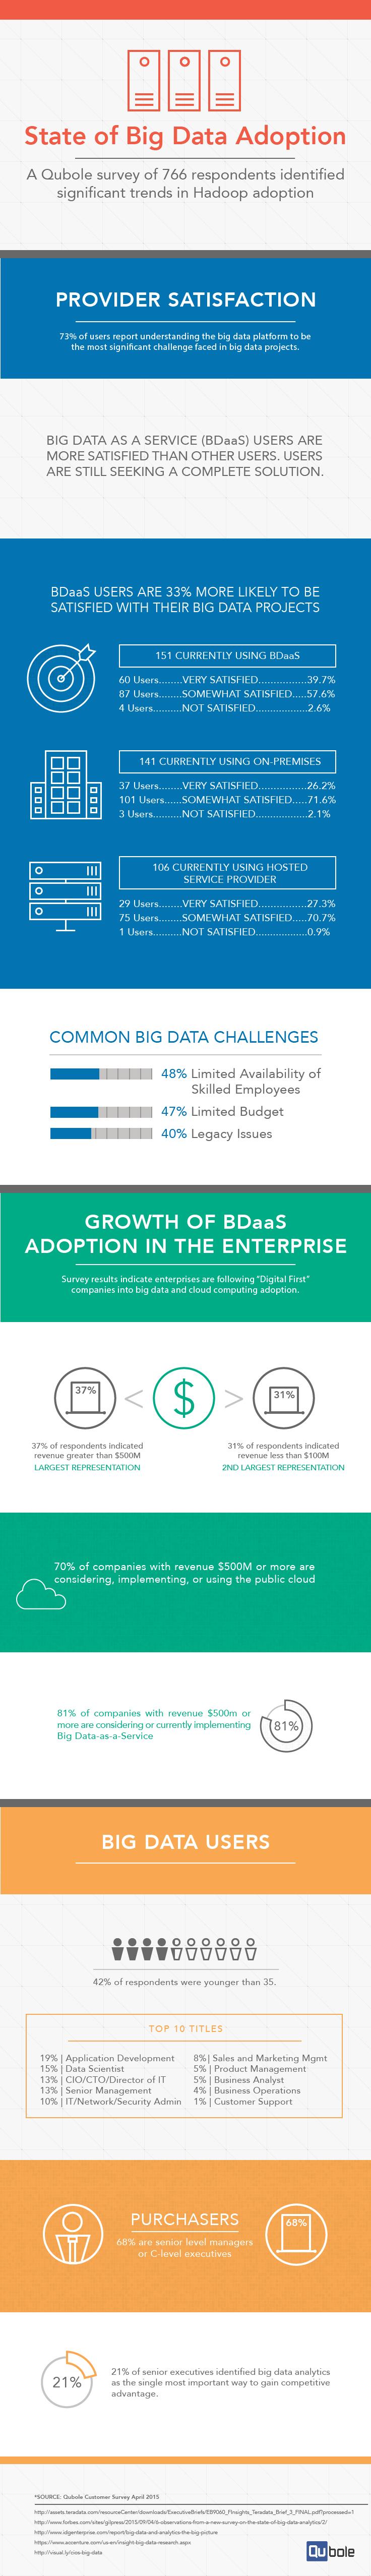 how big data solutions benefiting enterprises